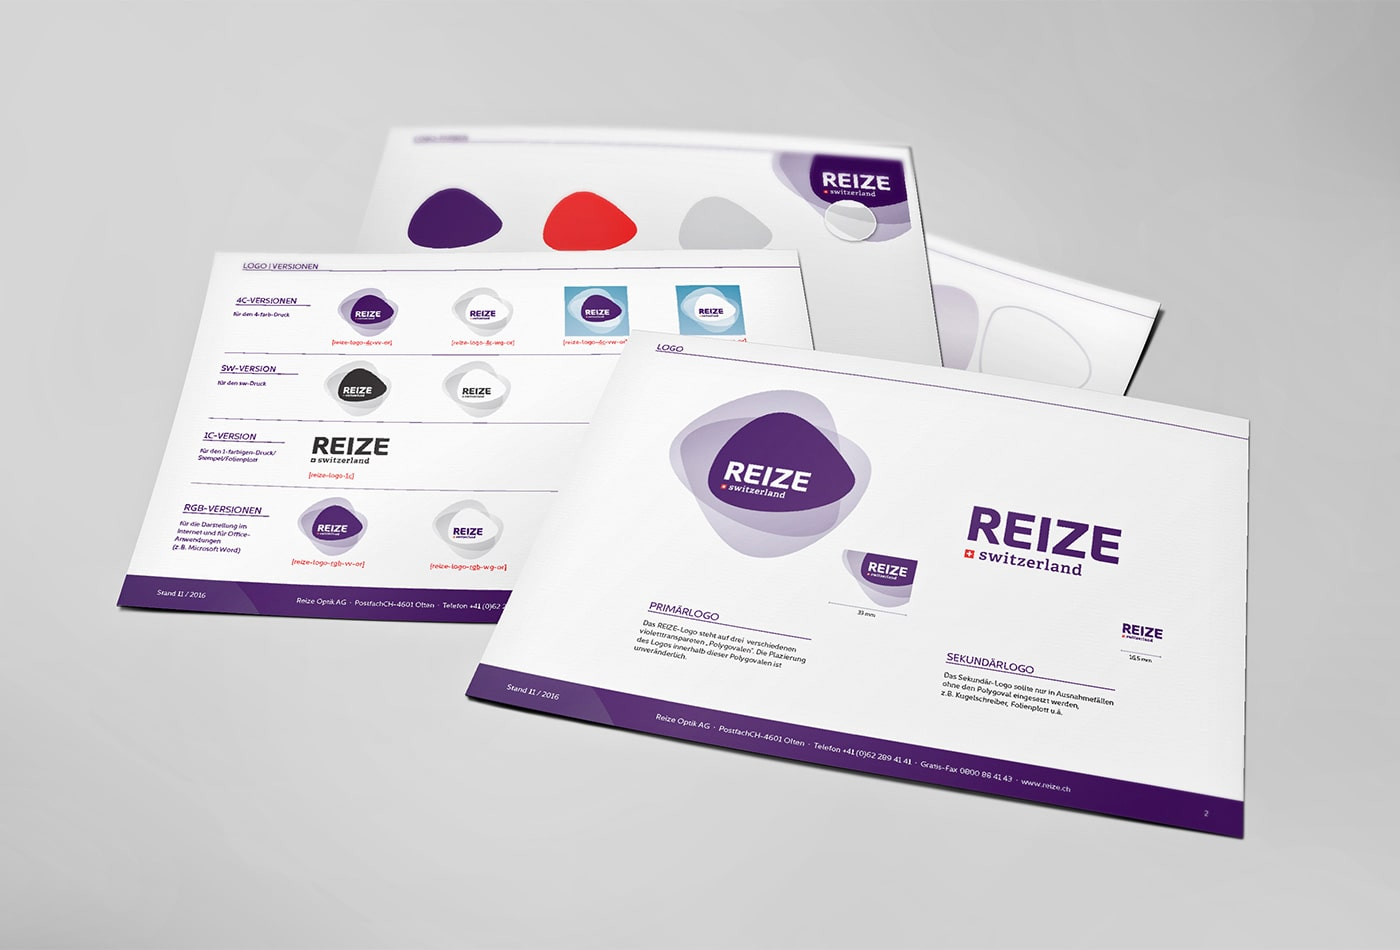 REIZE Handbuch